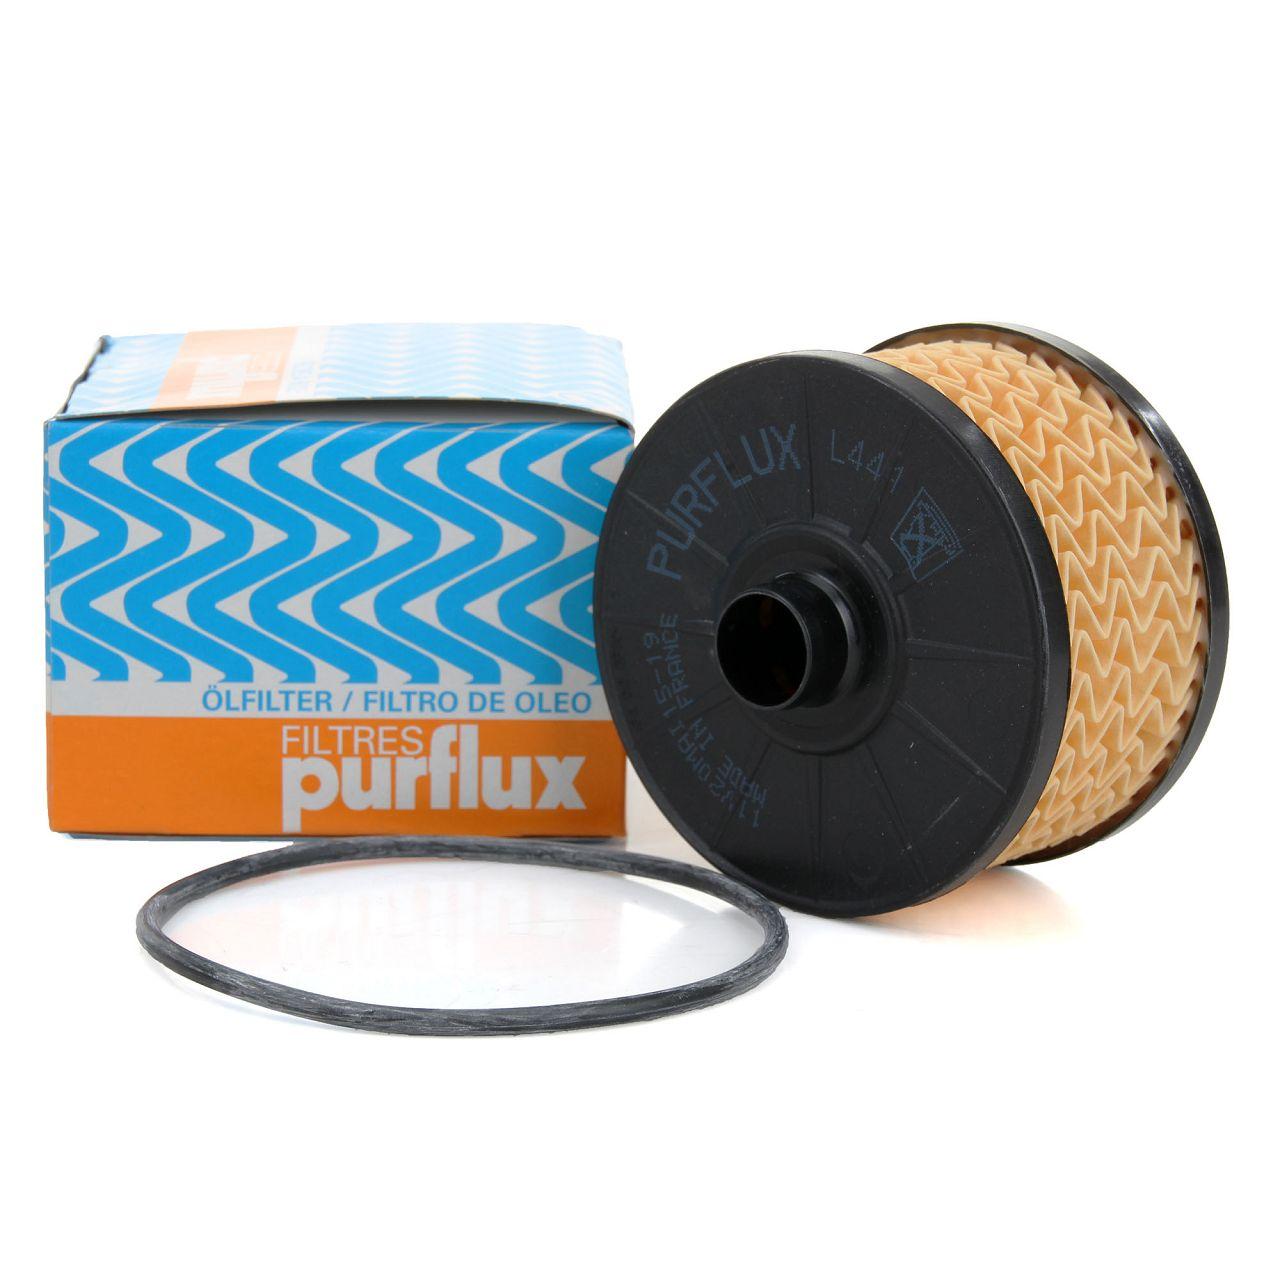 PURFLUX L441 Ölfilter + Dichtung DACIA MERCEDES-BENZ NISSAN RENAULT 0.9-1.4